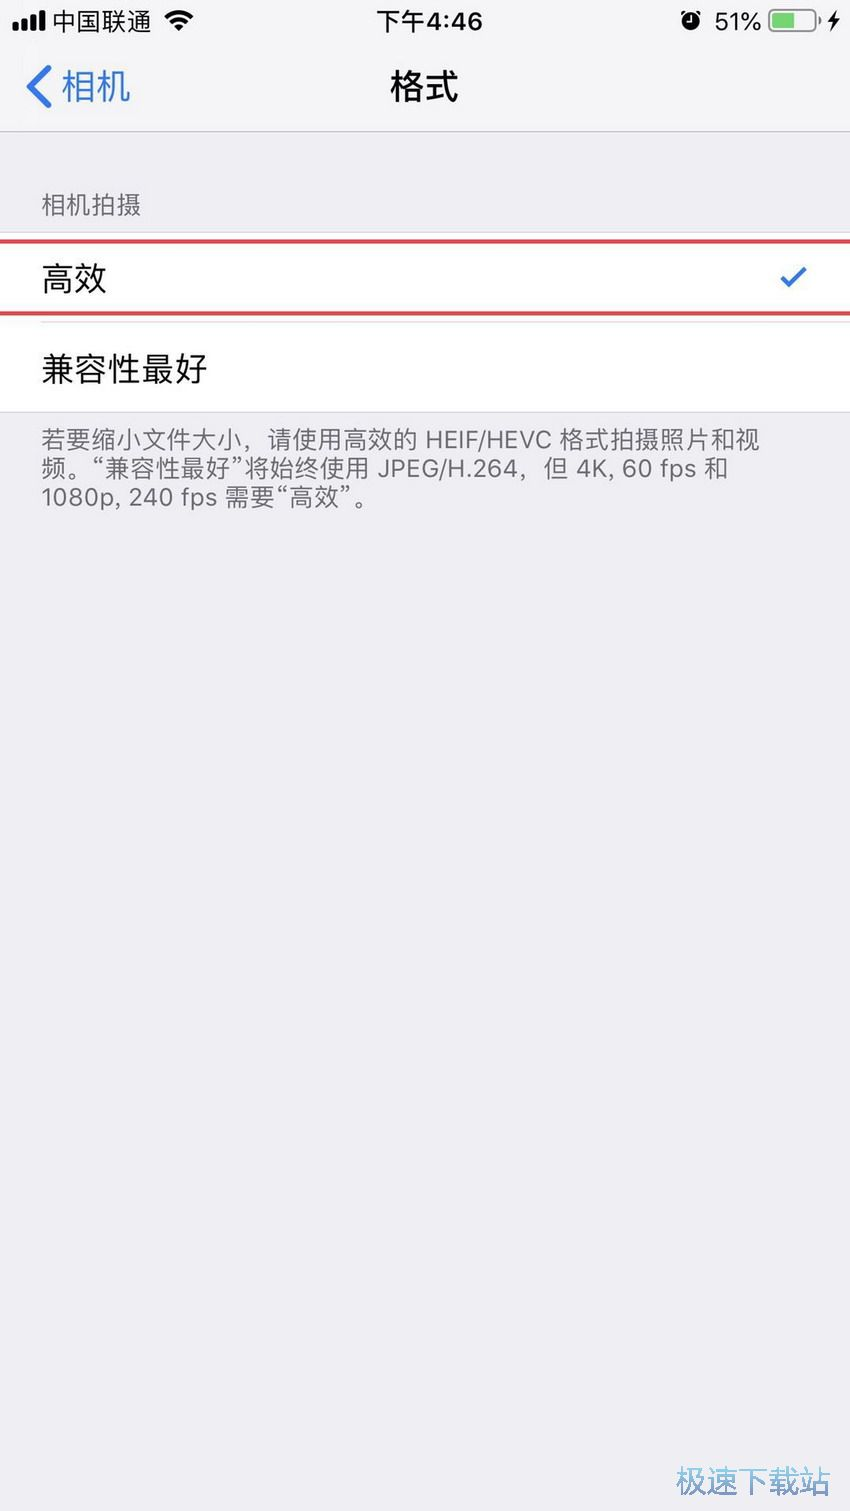 iPhone如何优化相册照片降低占用空间? 缩略图